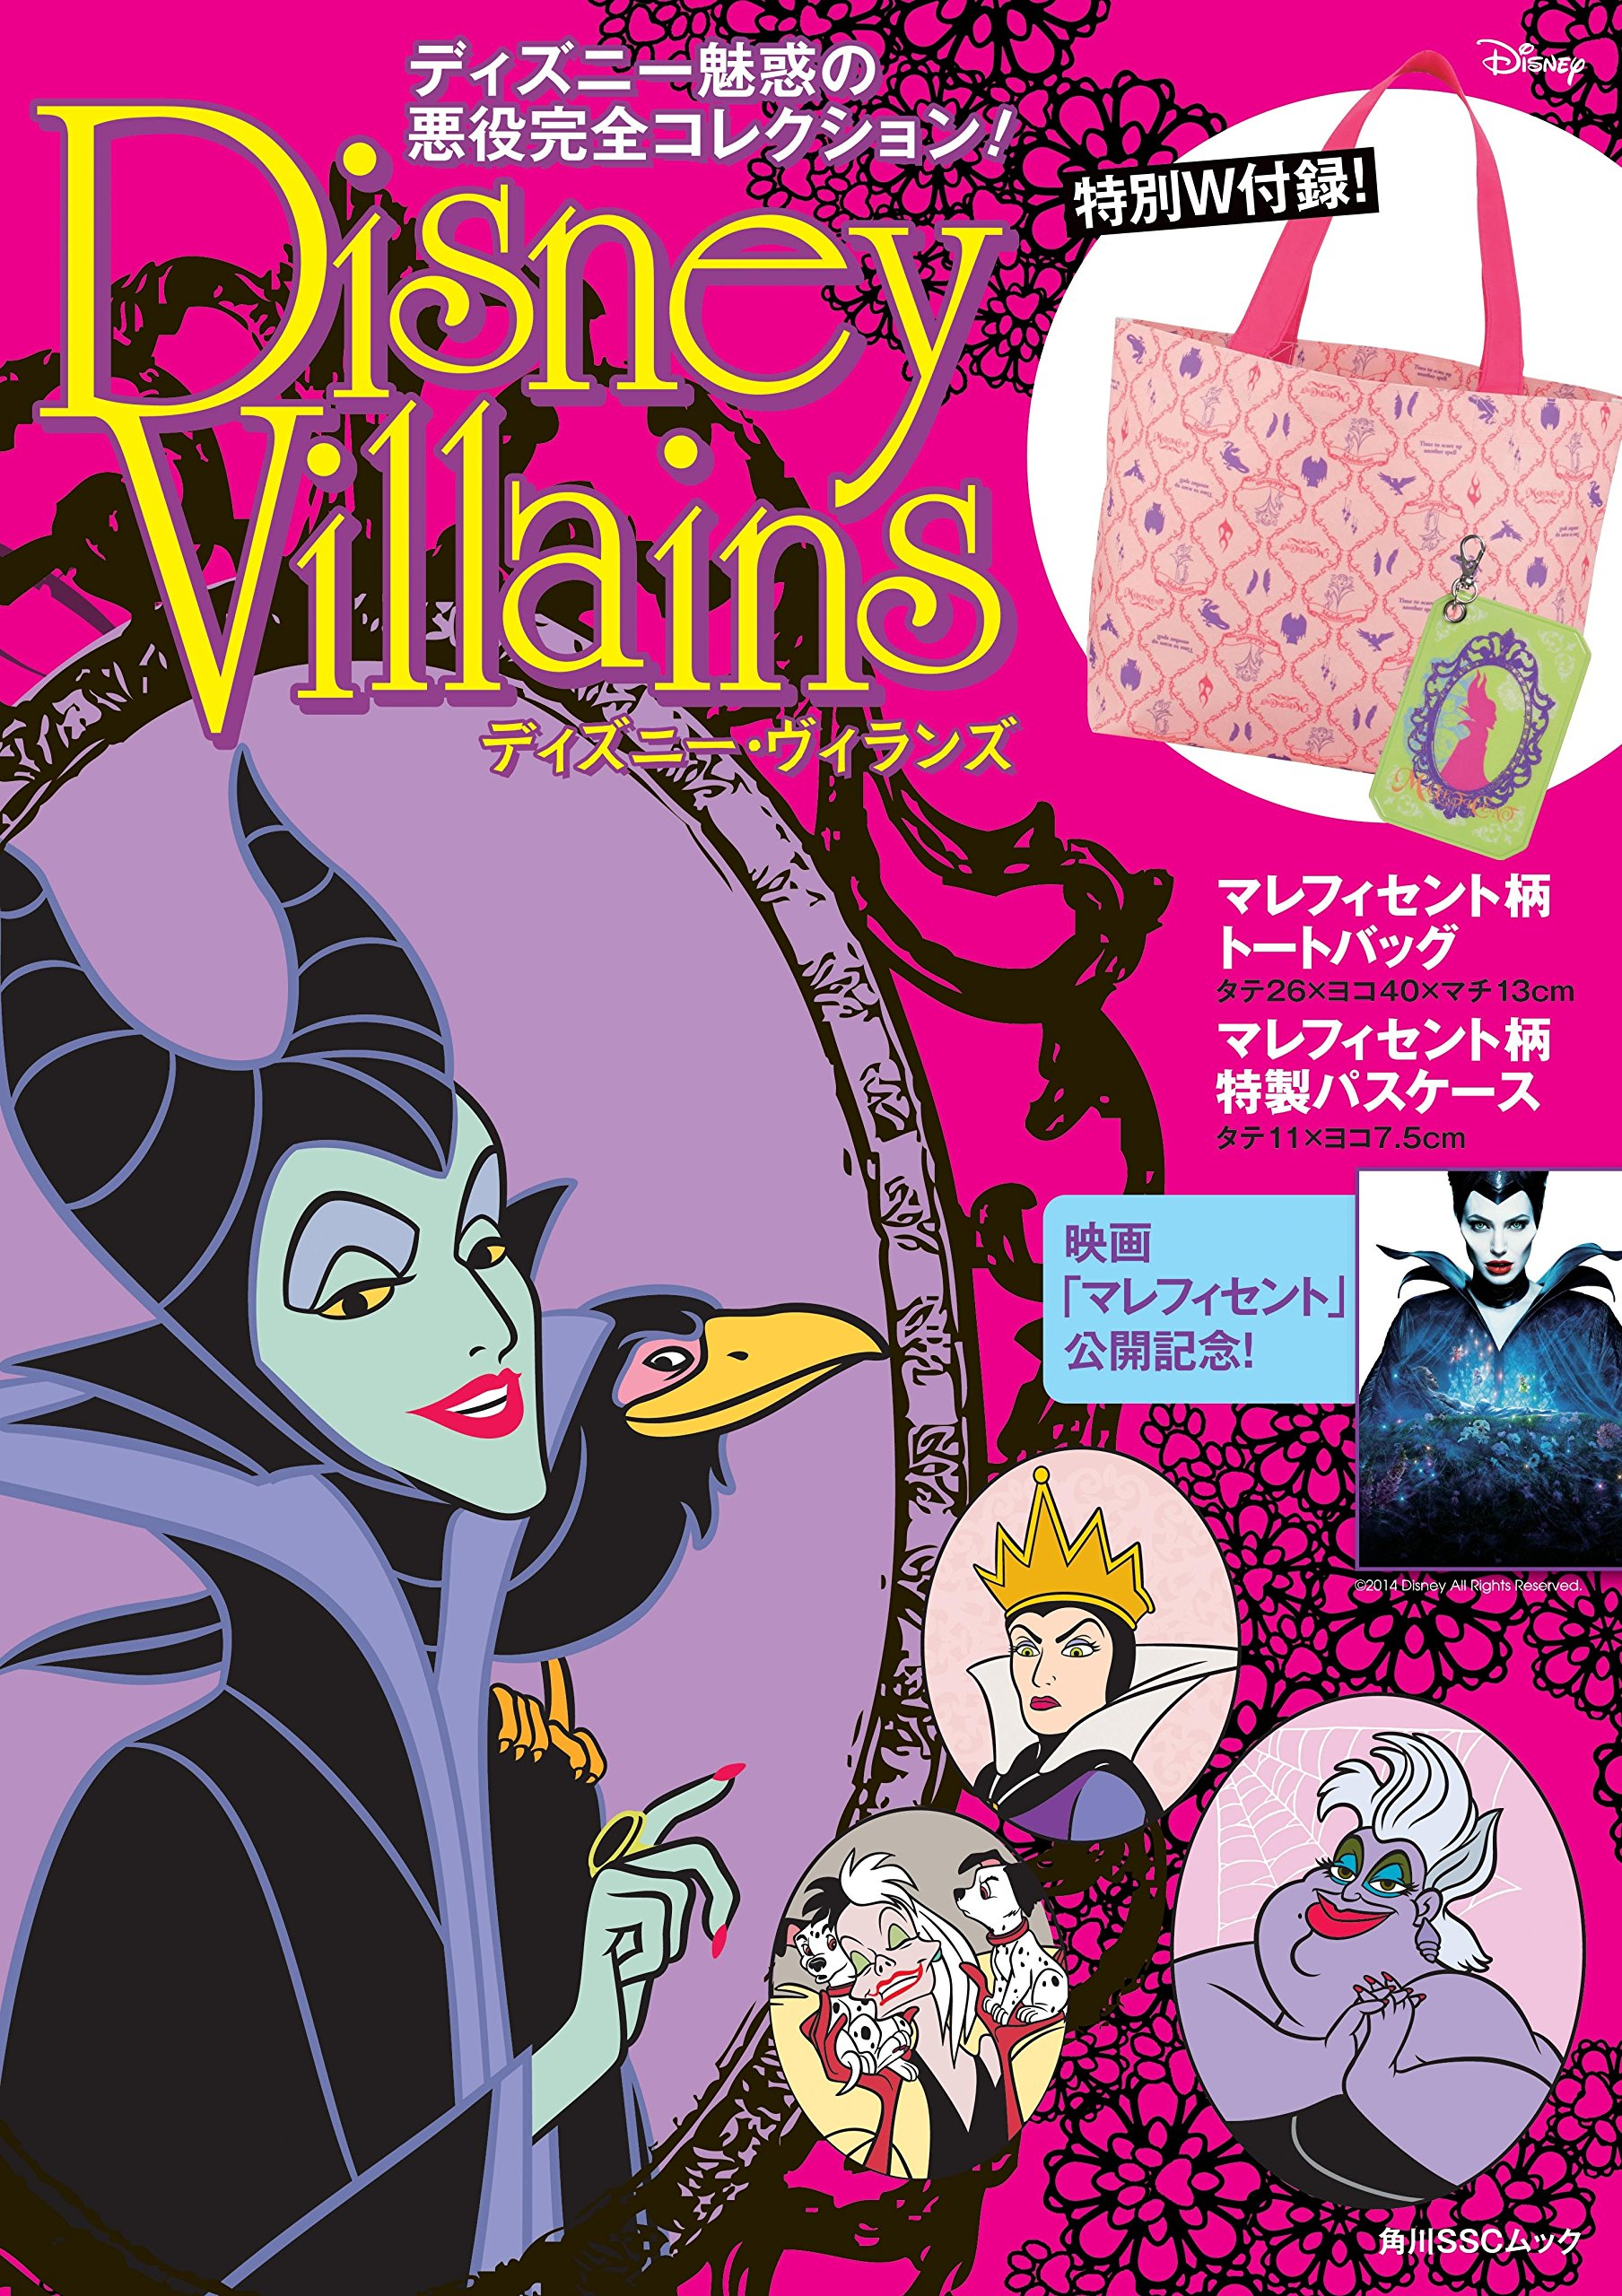 Disney Villains ディズニーヴィランズ60101 99 角川sscムック 本